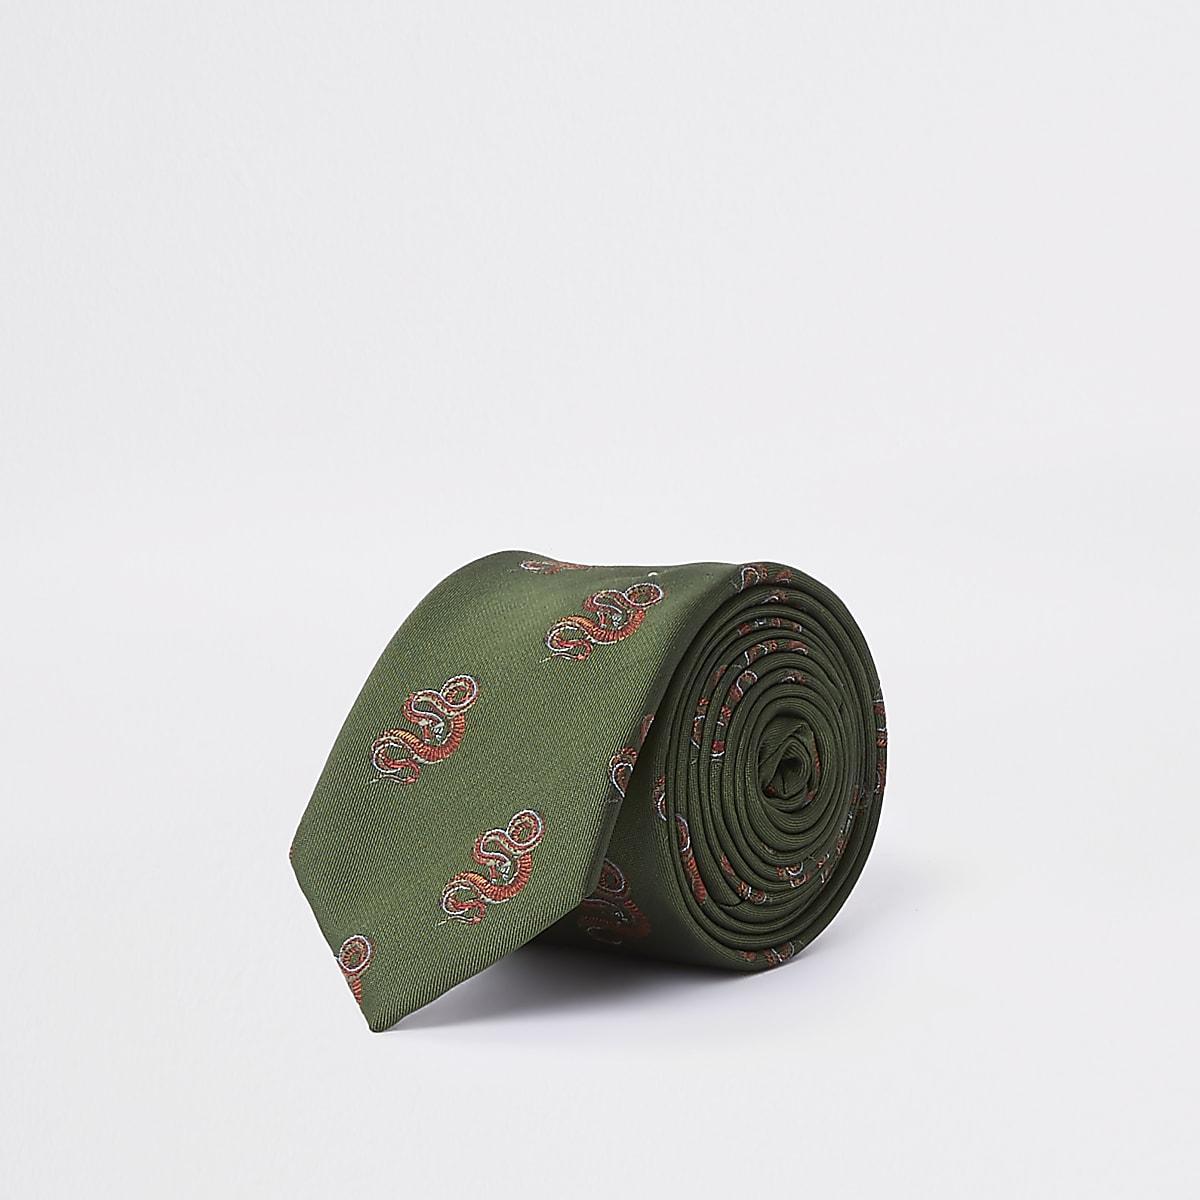 Cravate verte à imprimé peau de serpent